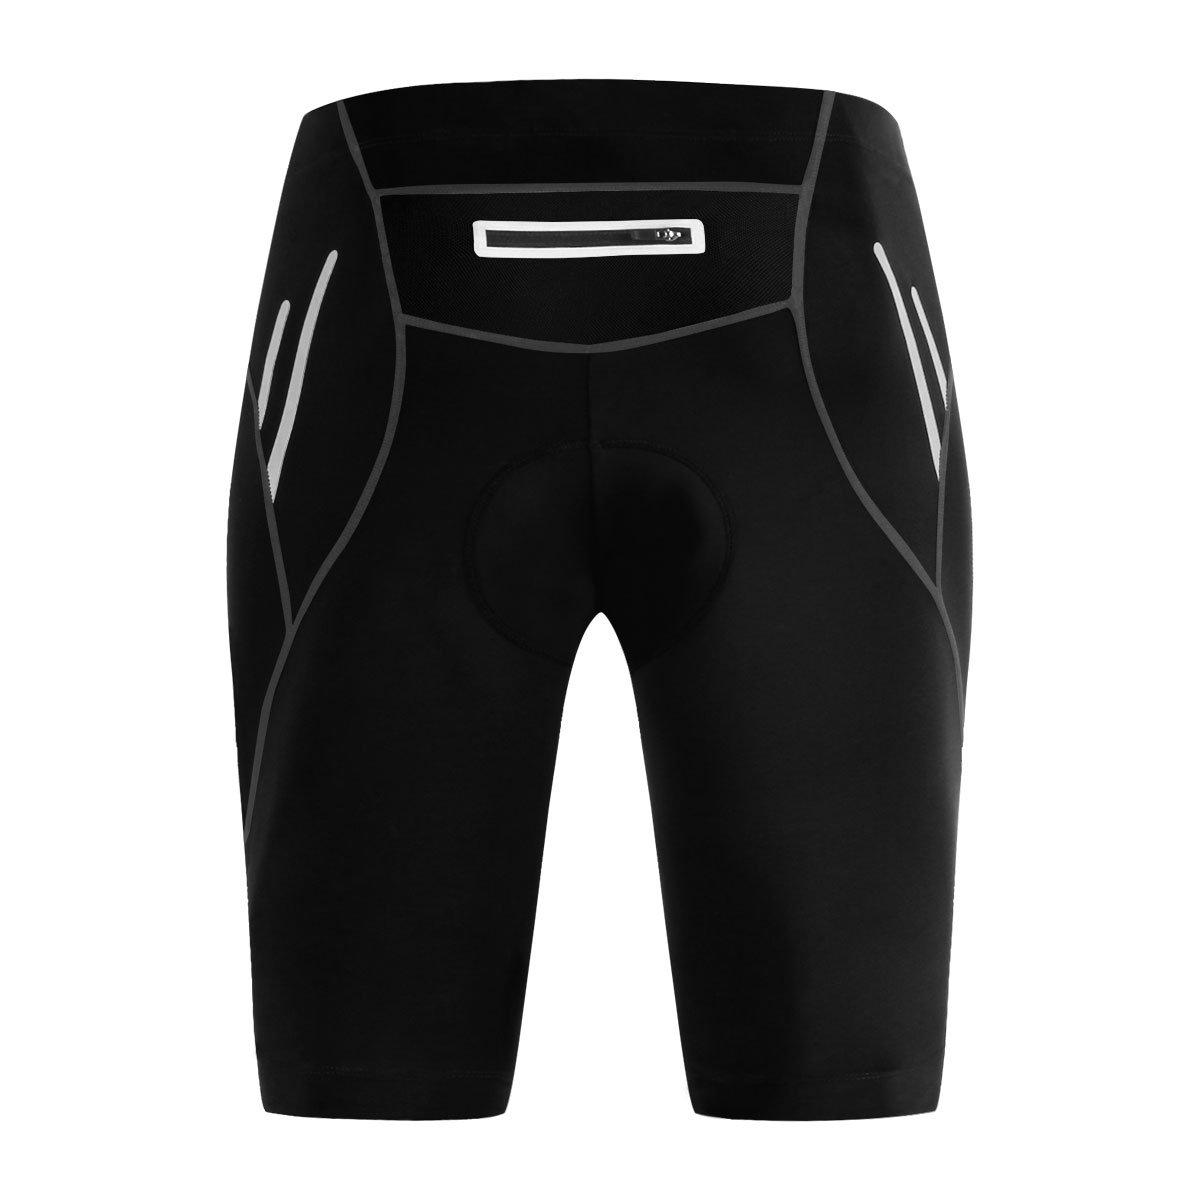 LiangyndaLian Männer Klettern Shorts Silikon Sitz Atmungsaktiv High Impact UV-Schutz Jersey Quick-dry Fahrradbekleidung